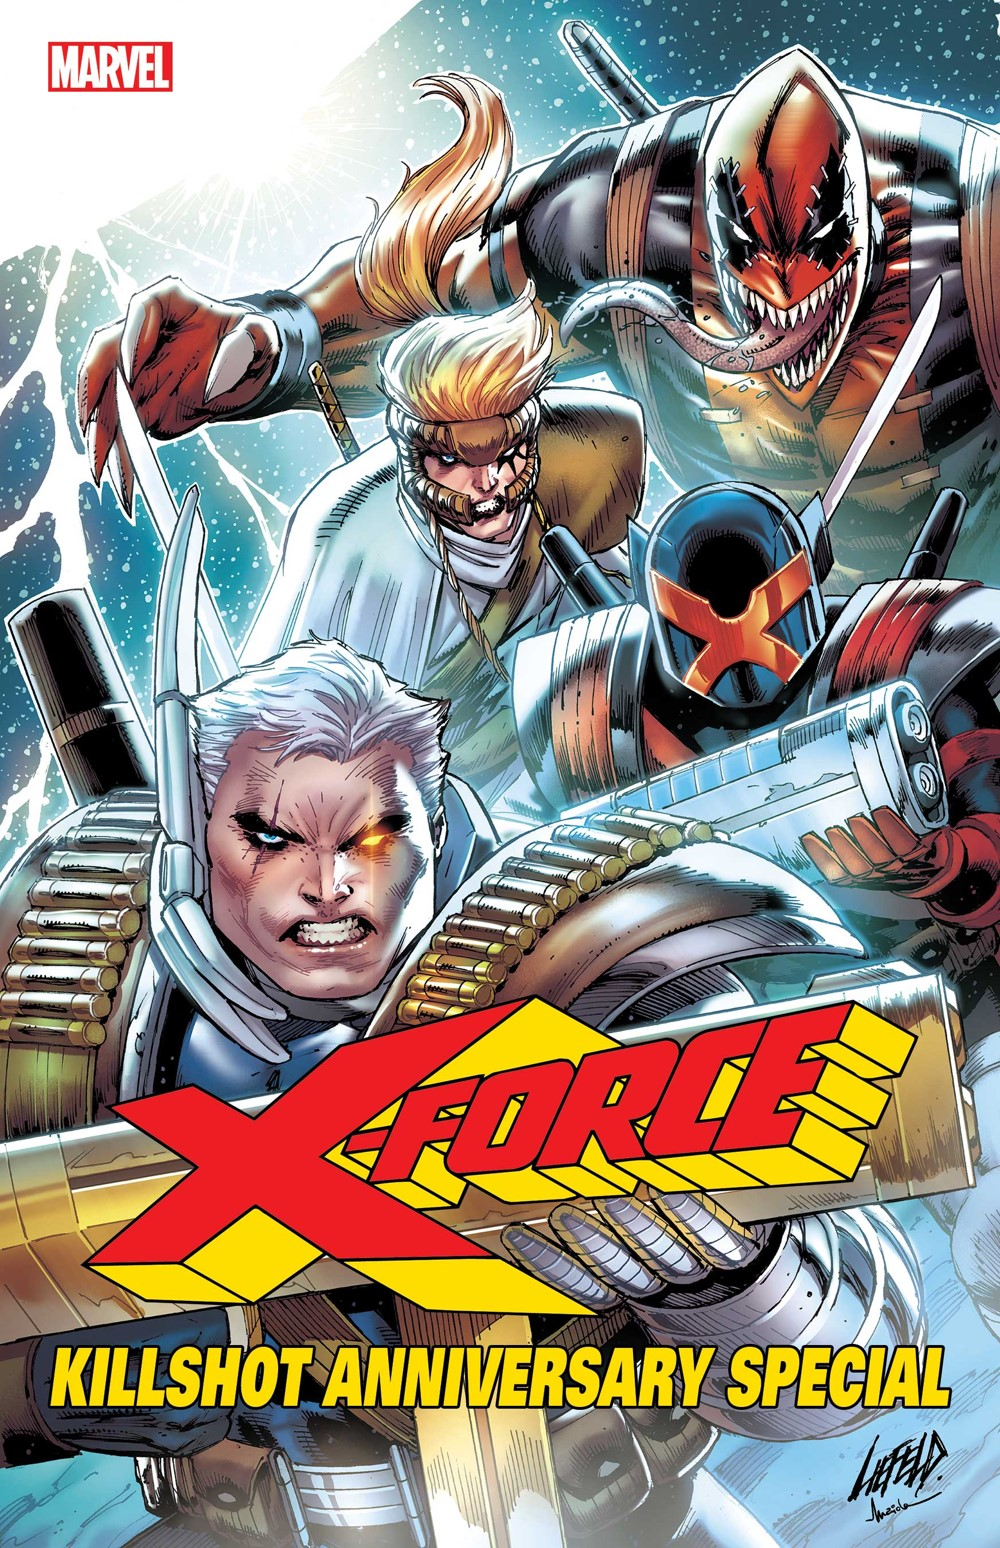 XFORCEKILLS2021001_RL_VAR Marvel Comics November 2021 Solicitations